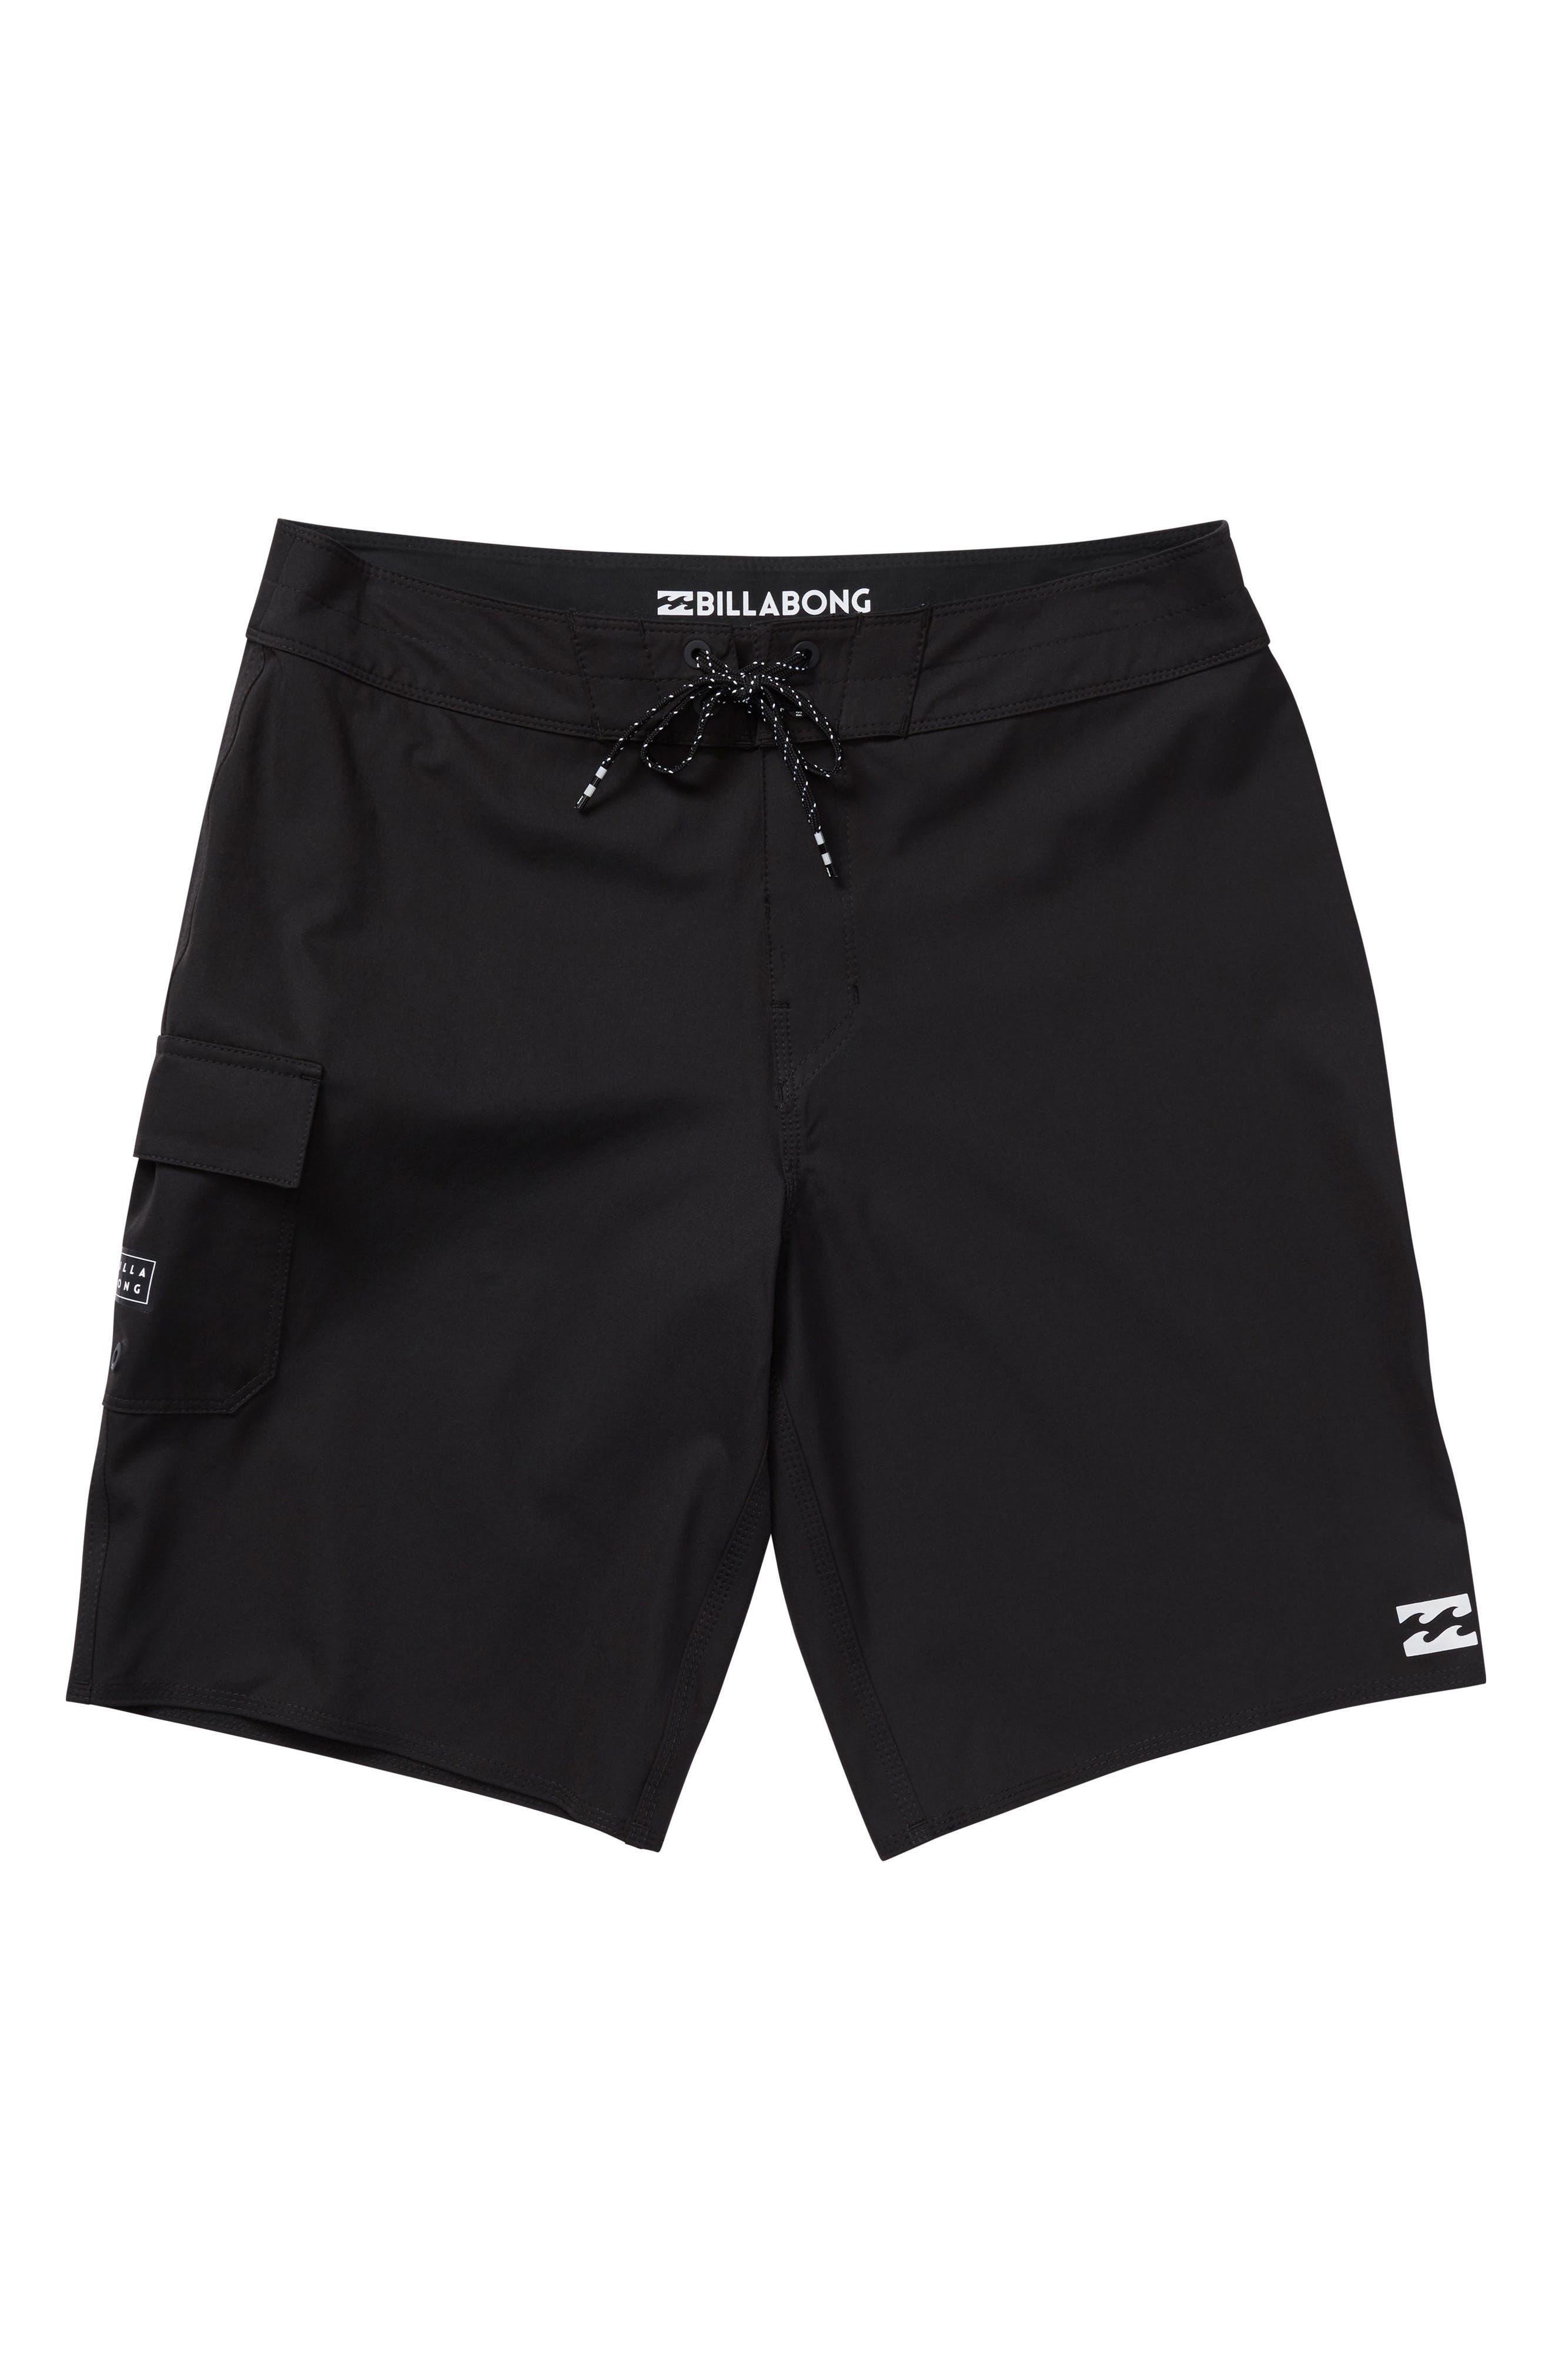 BILLABONG All Day X Board Shorts, Main, color, 001